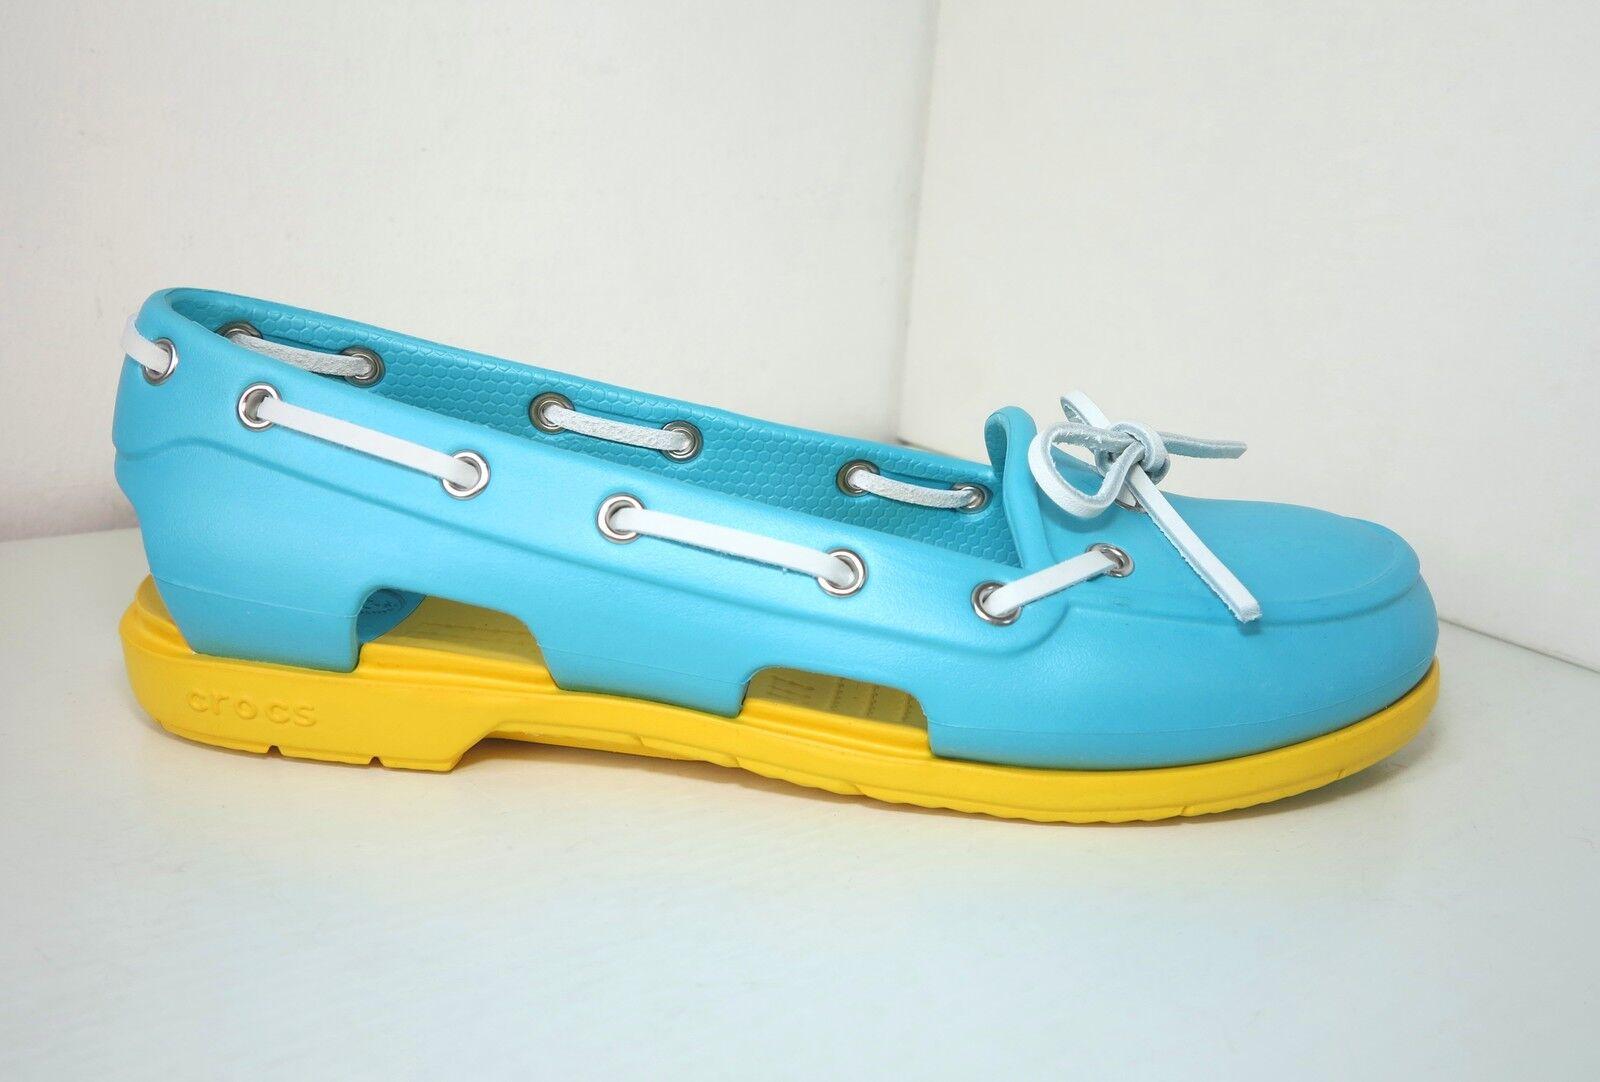 Crocs Ballerina Segelschuhe türkis W 10 40 41  beach gelb line boat shoe aqua gelb beach 37c5d9